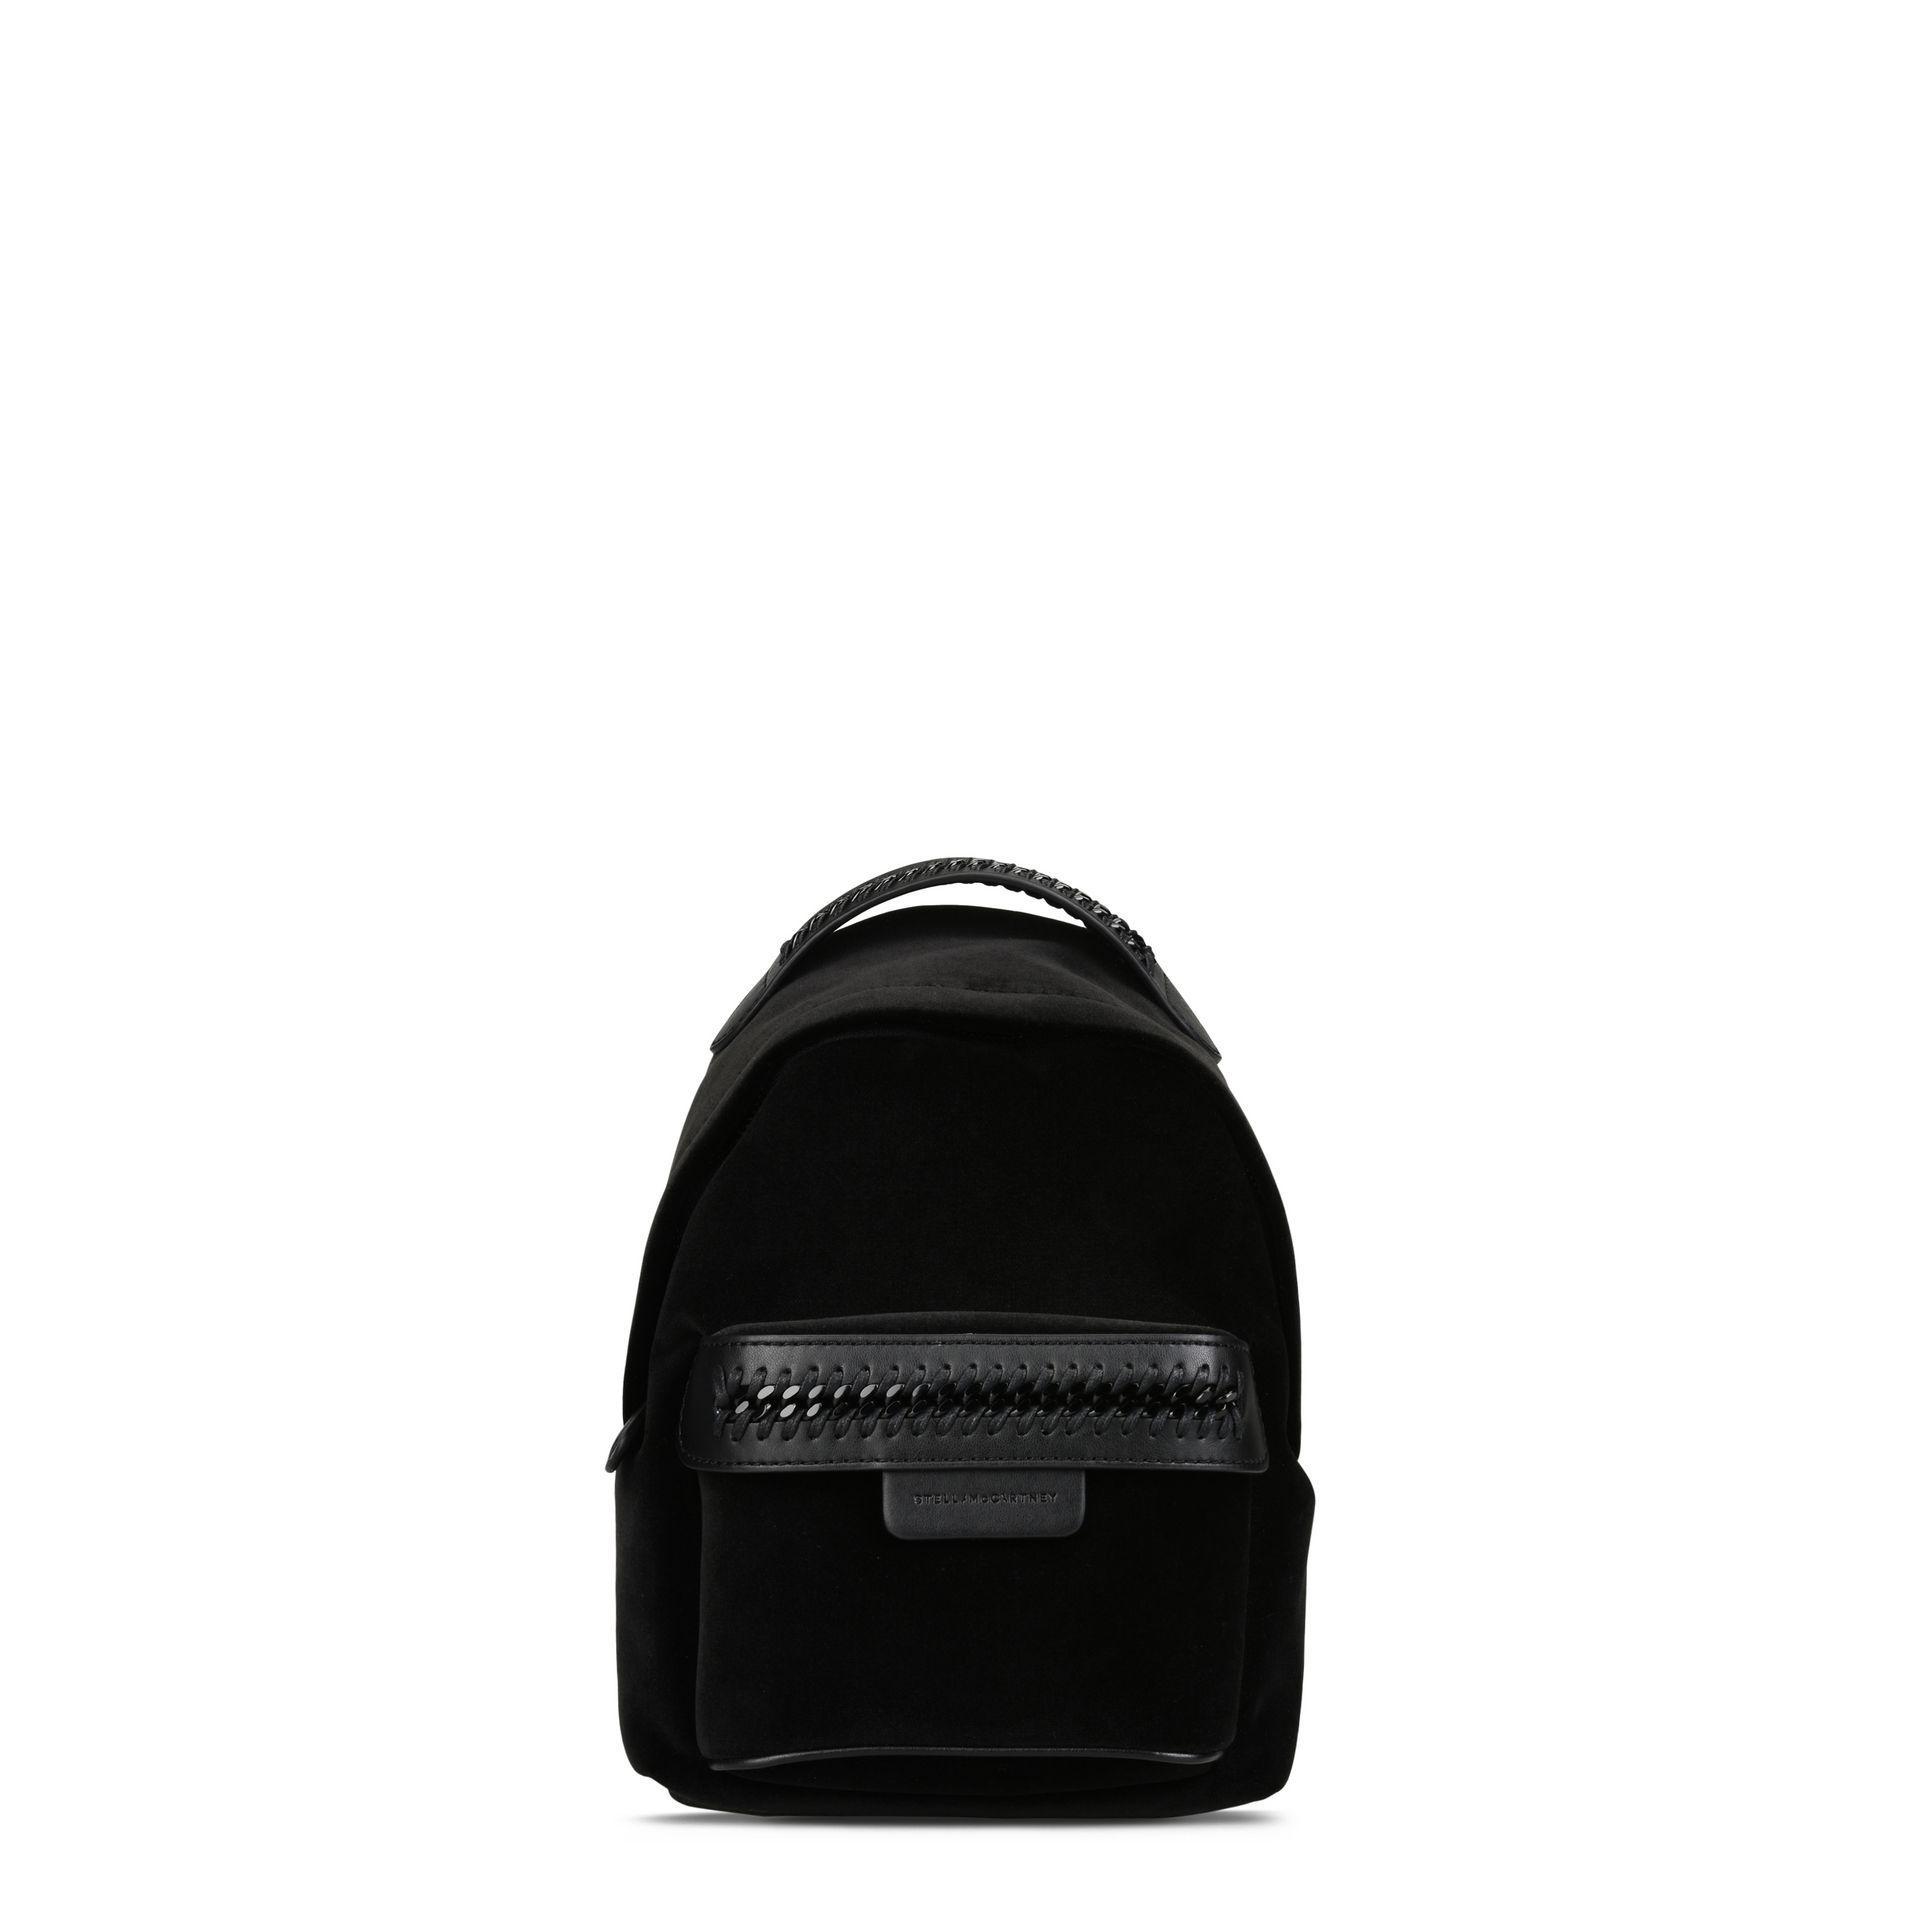 db539126c7a6c Stella McCartney Black Velvet Falabella Go Mini Backpack in Black - Lyst